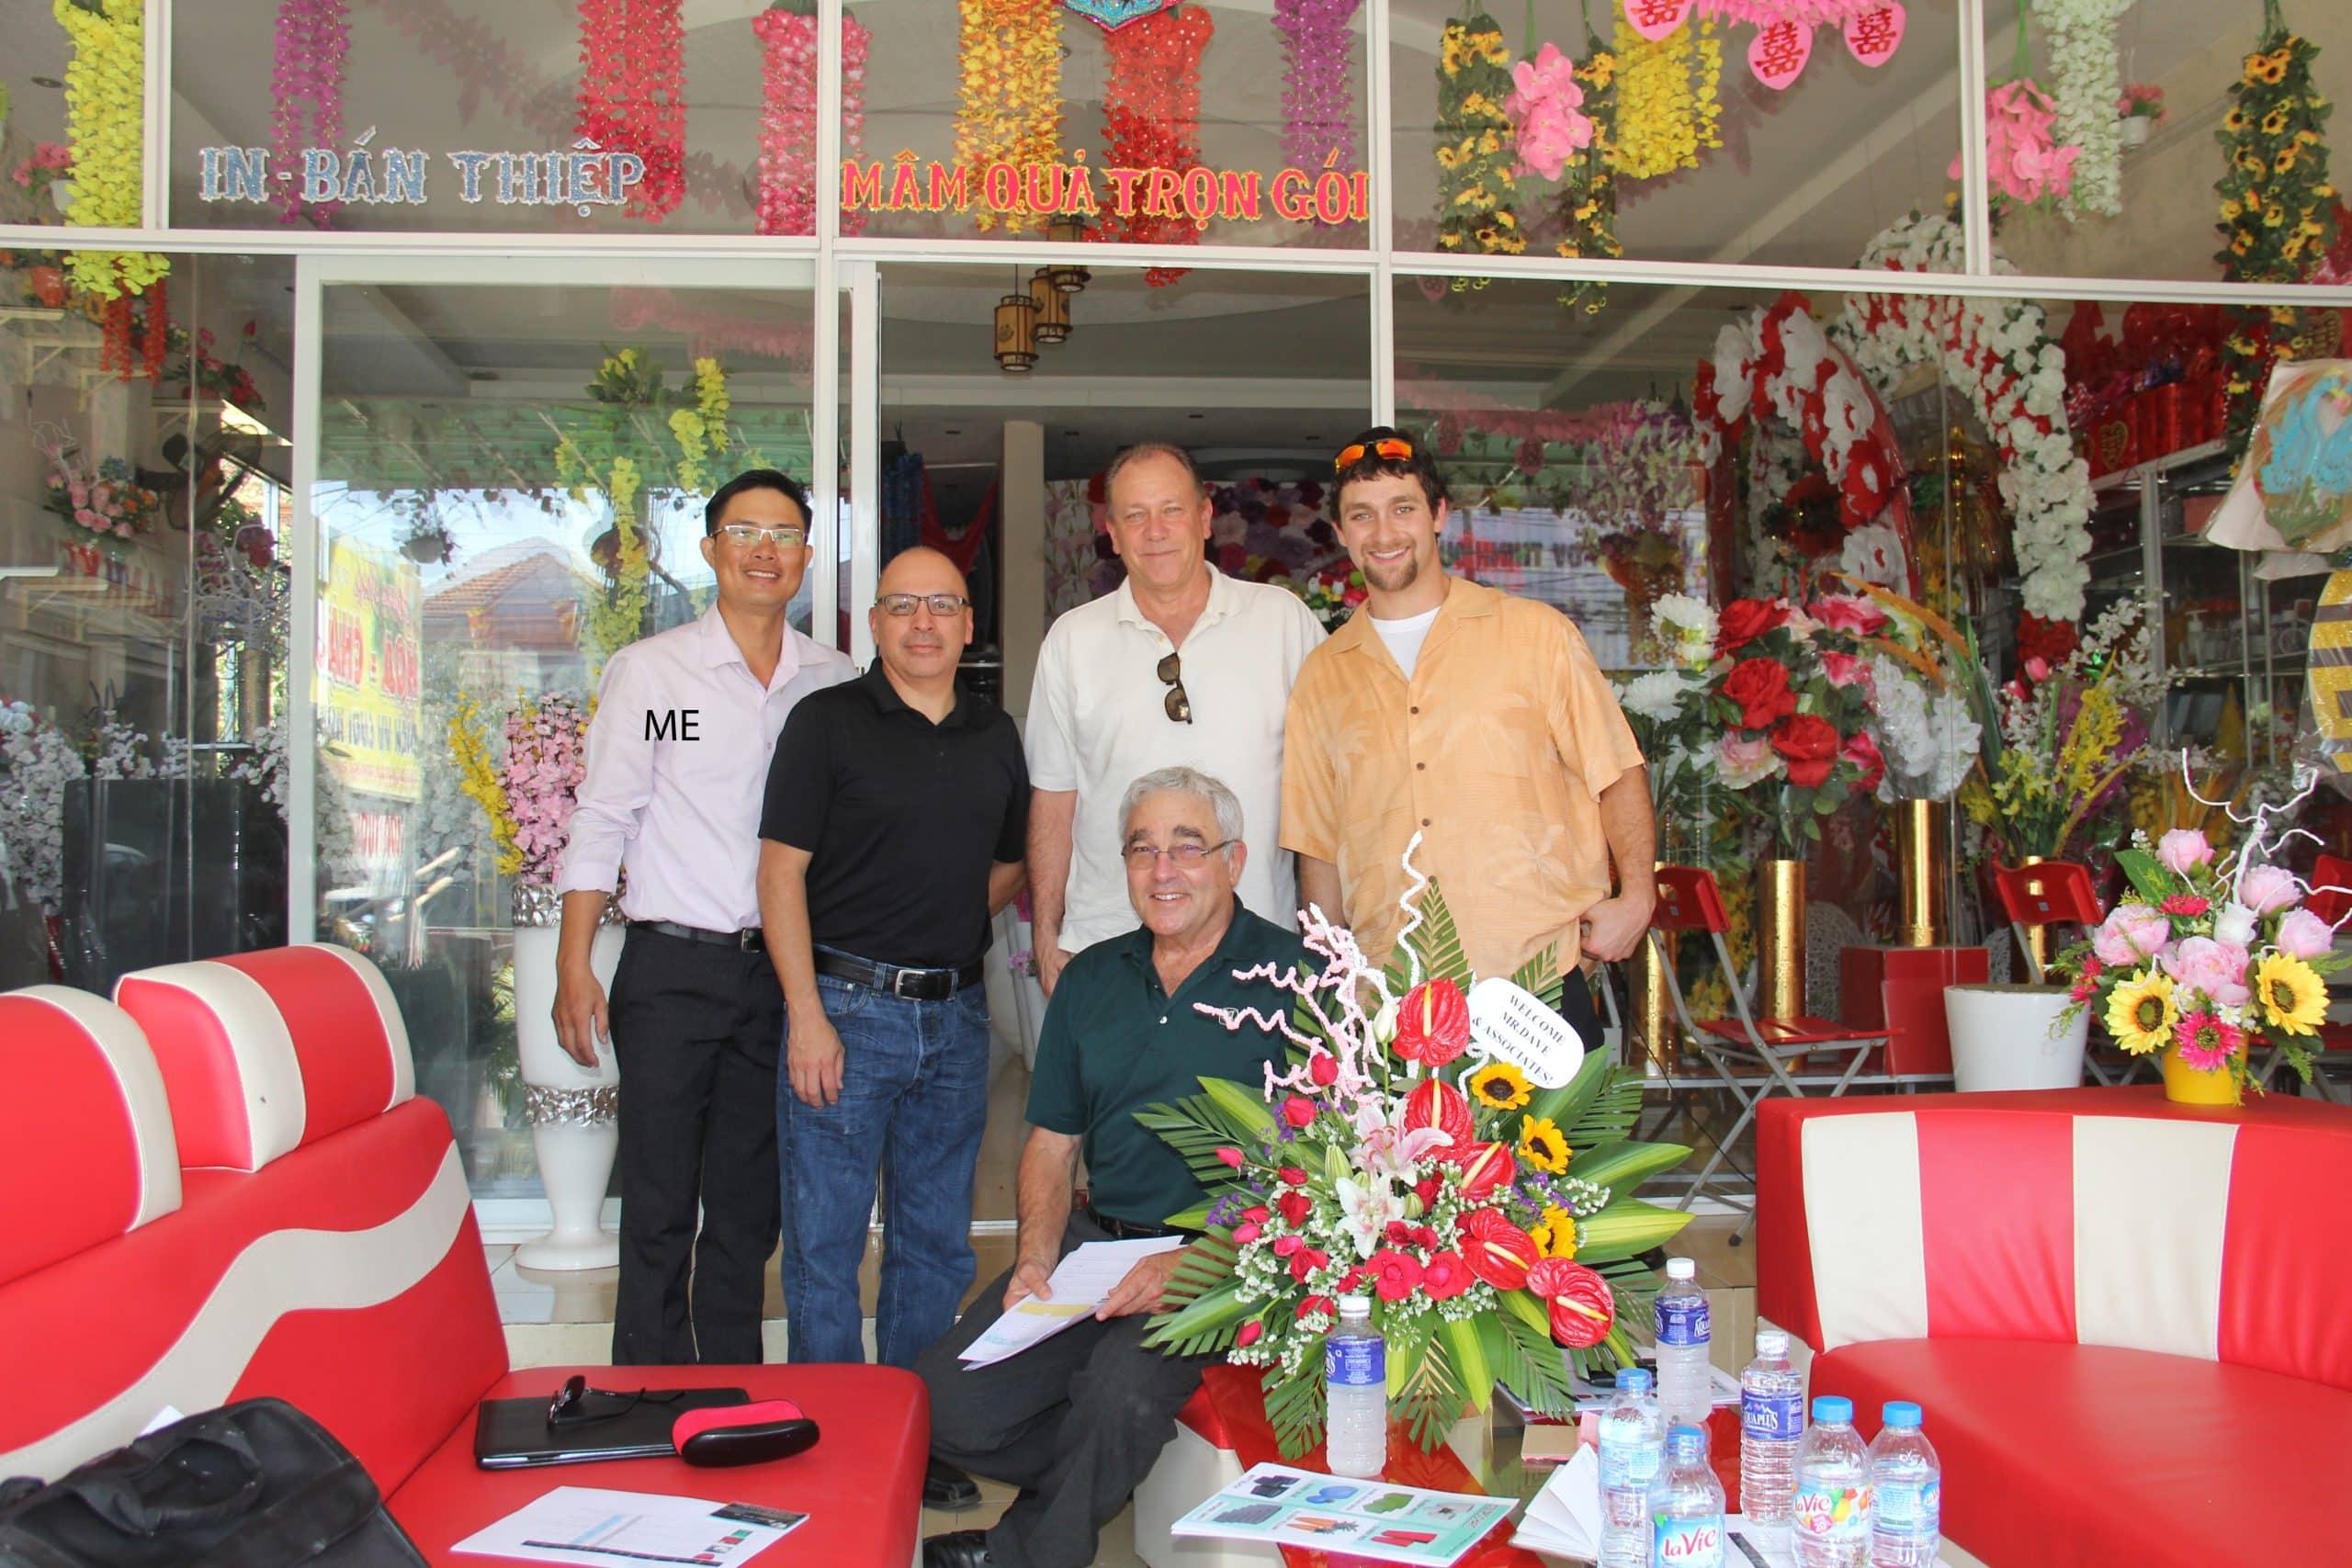 Sloat Garden Center Pottery On Feedspot Rss Feed